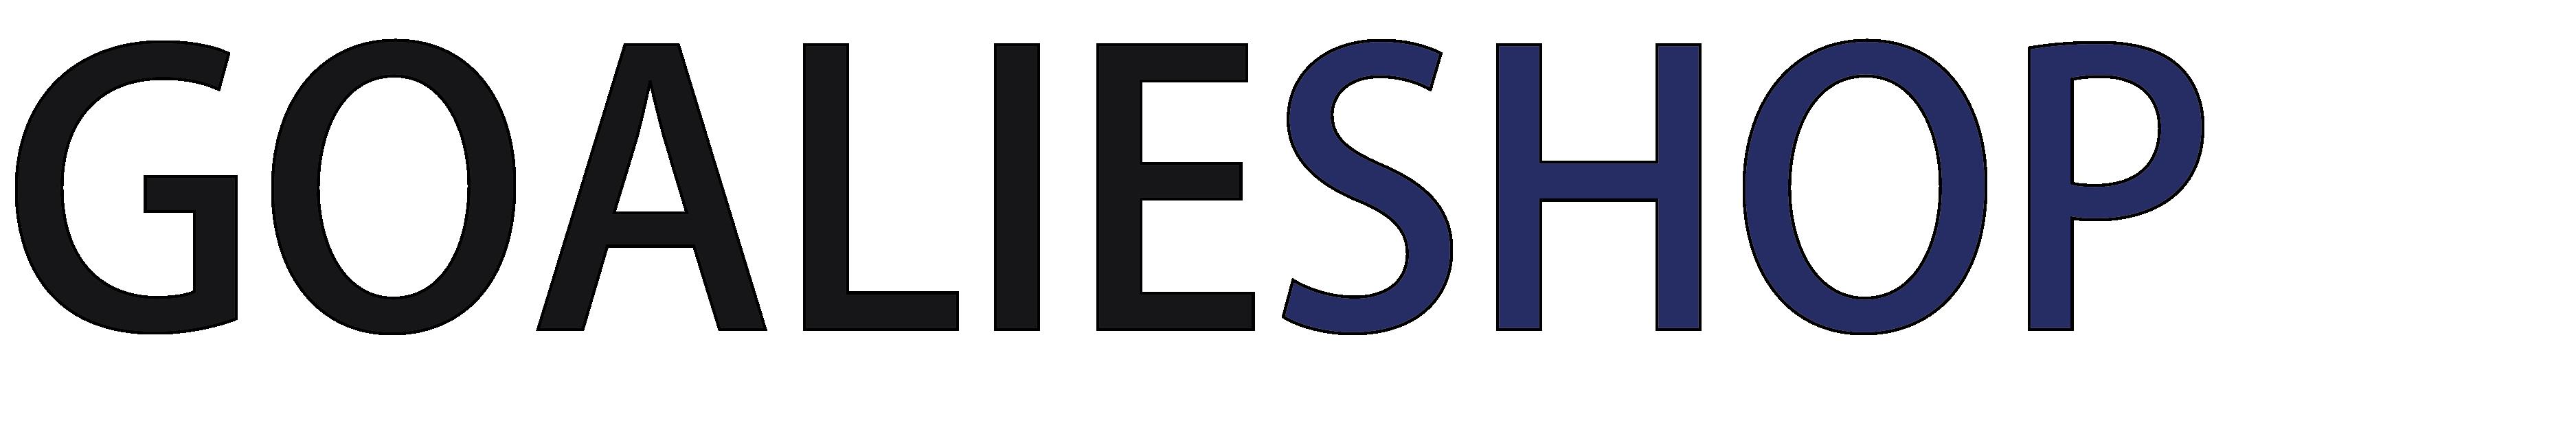 Goalieshop Logotyp